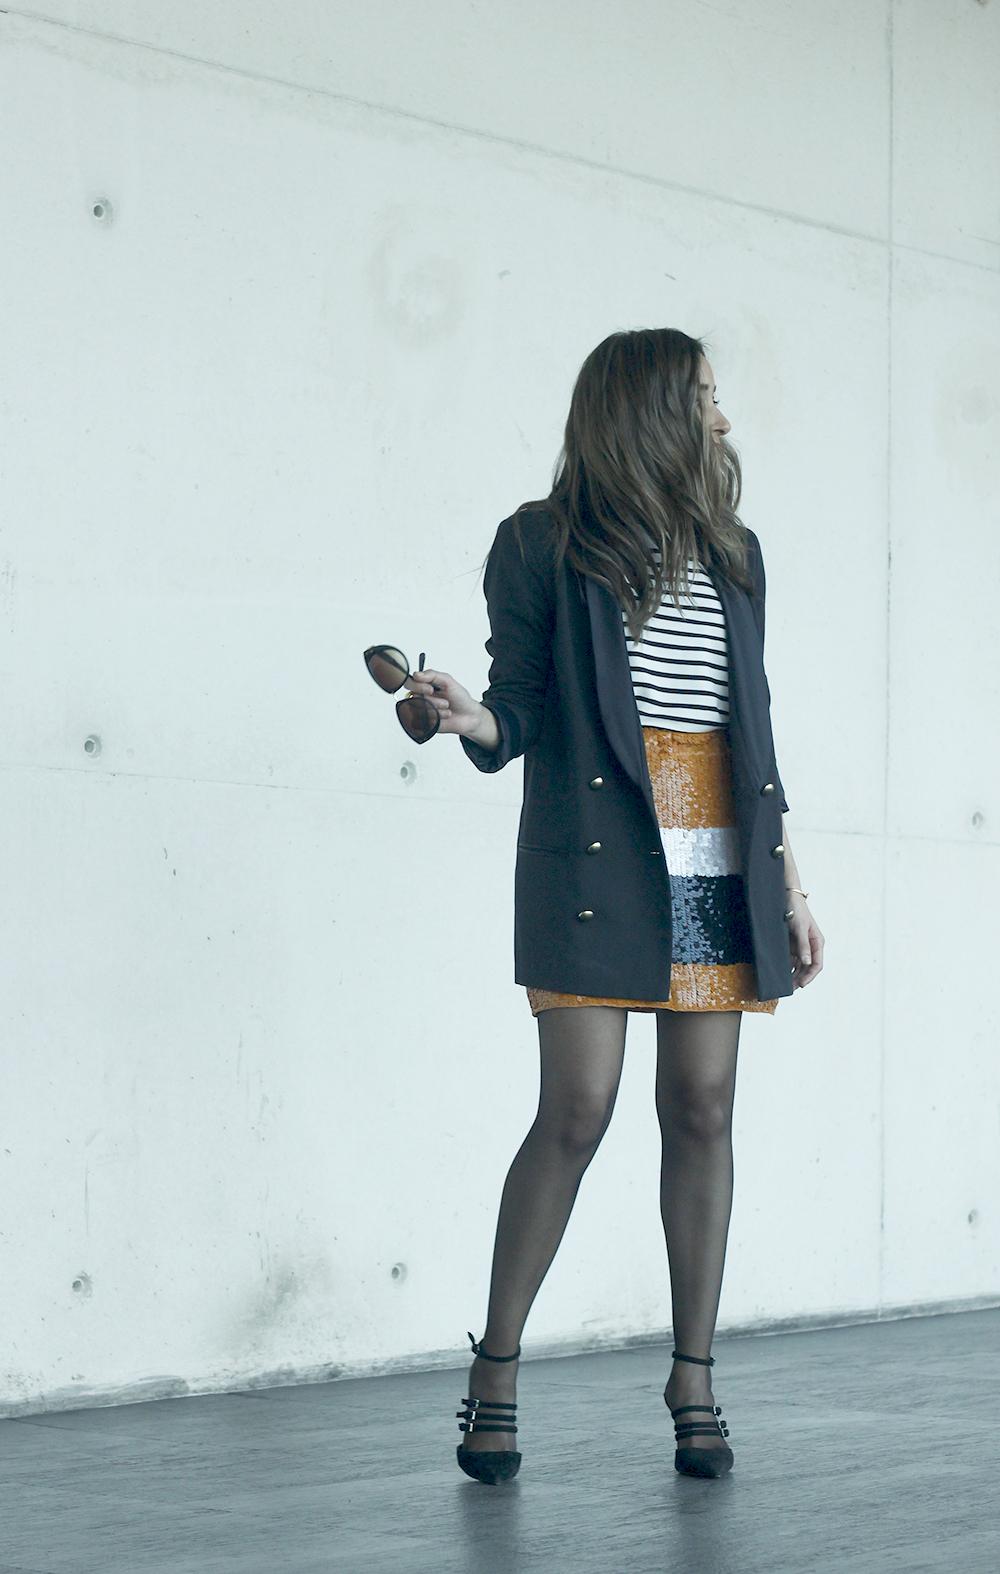 Striped T-Shirt Sequin skirt black blazer madrid fashion week street style fashion outfit04.jpg06